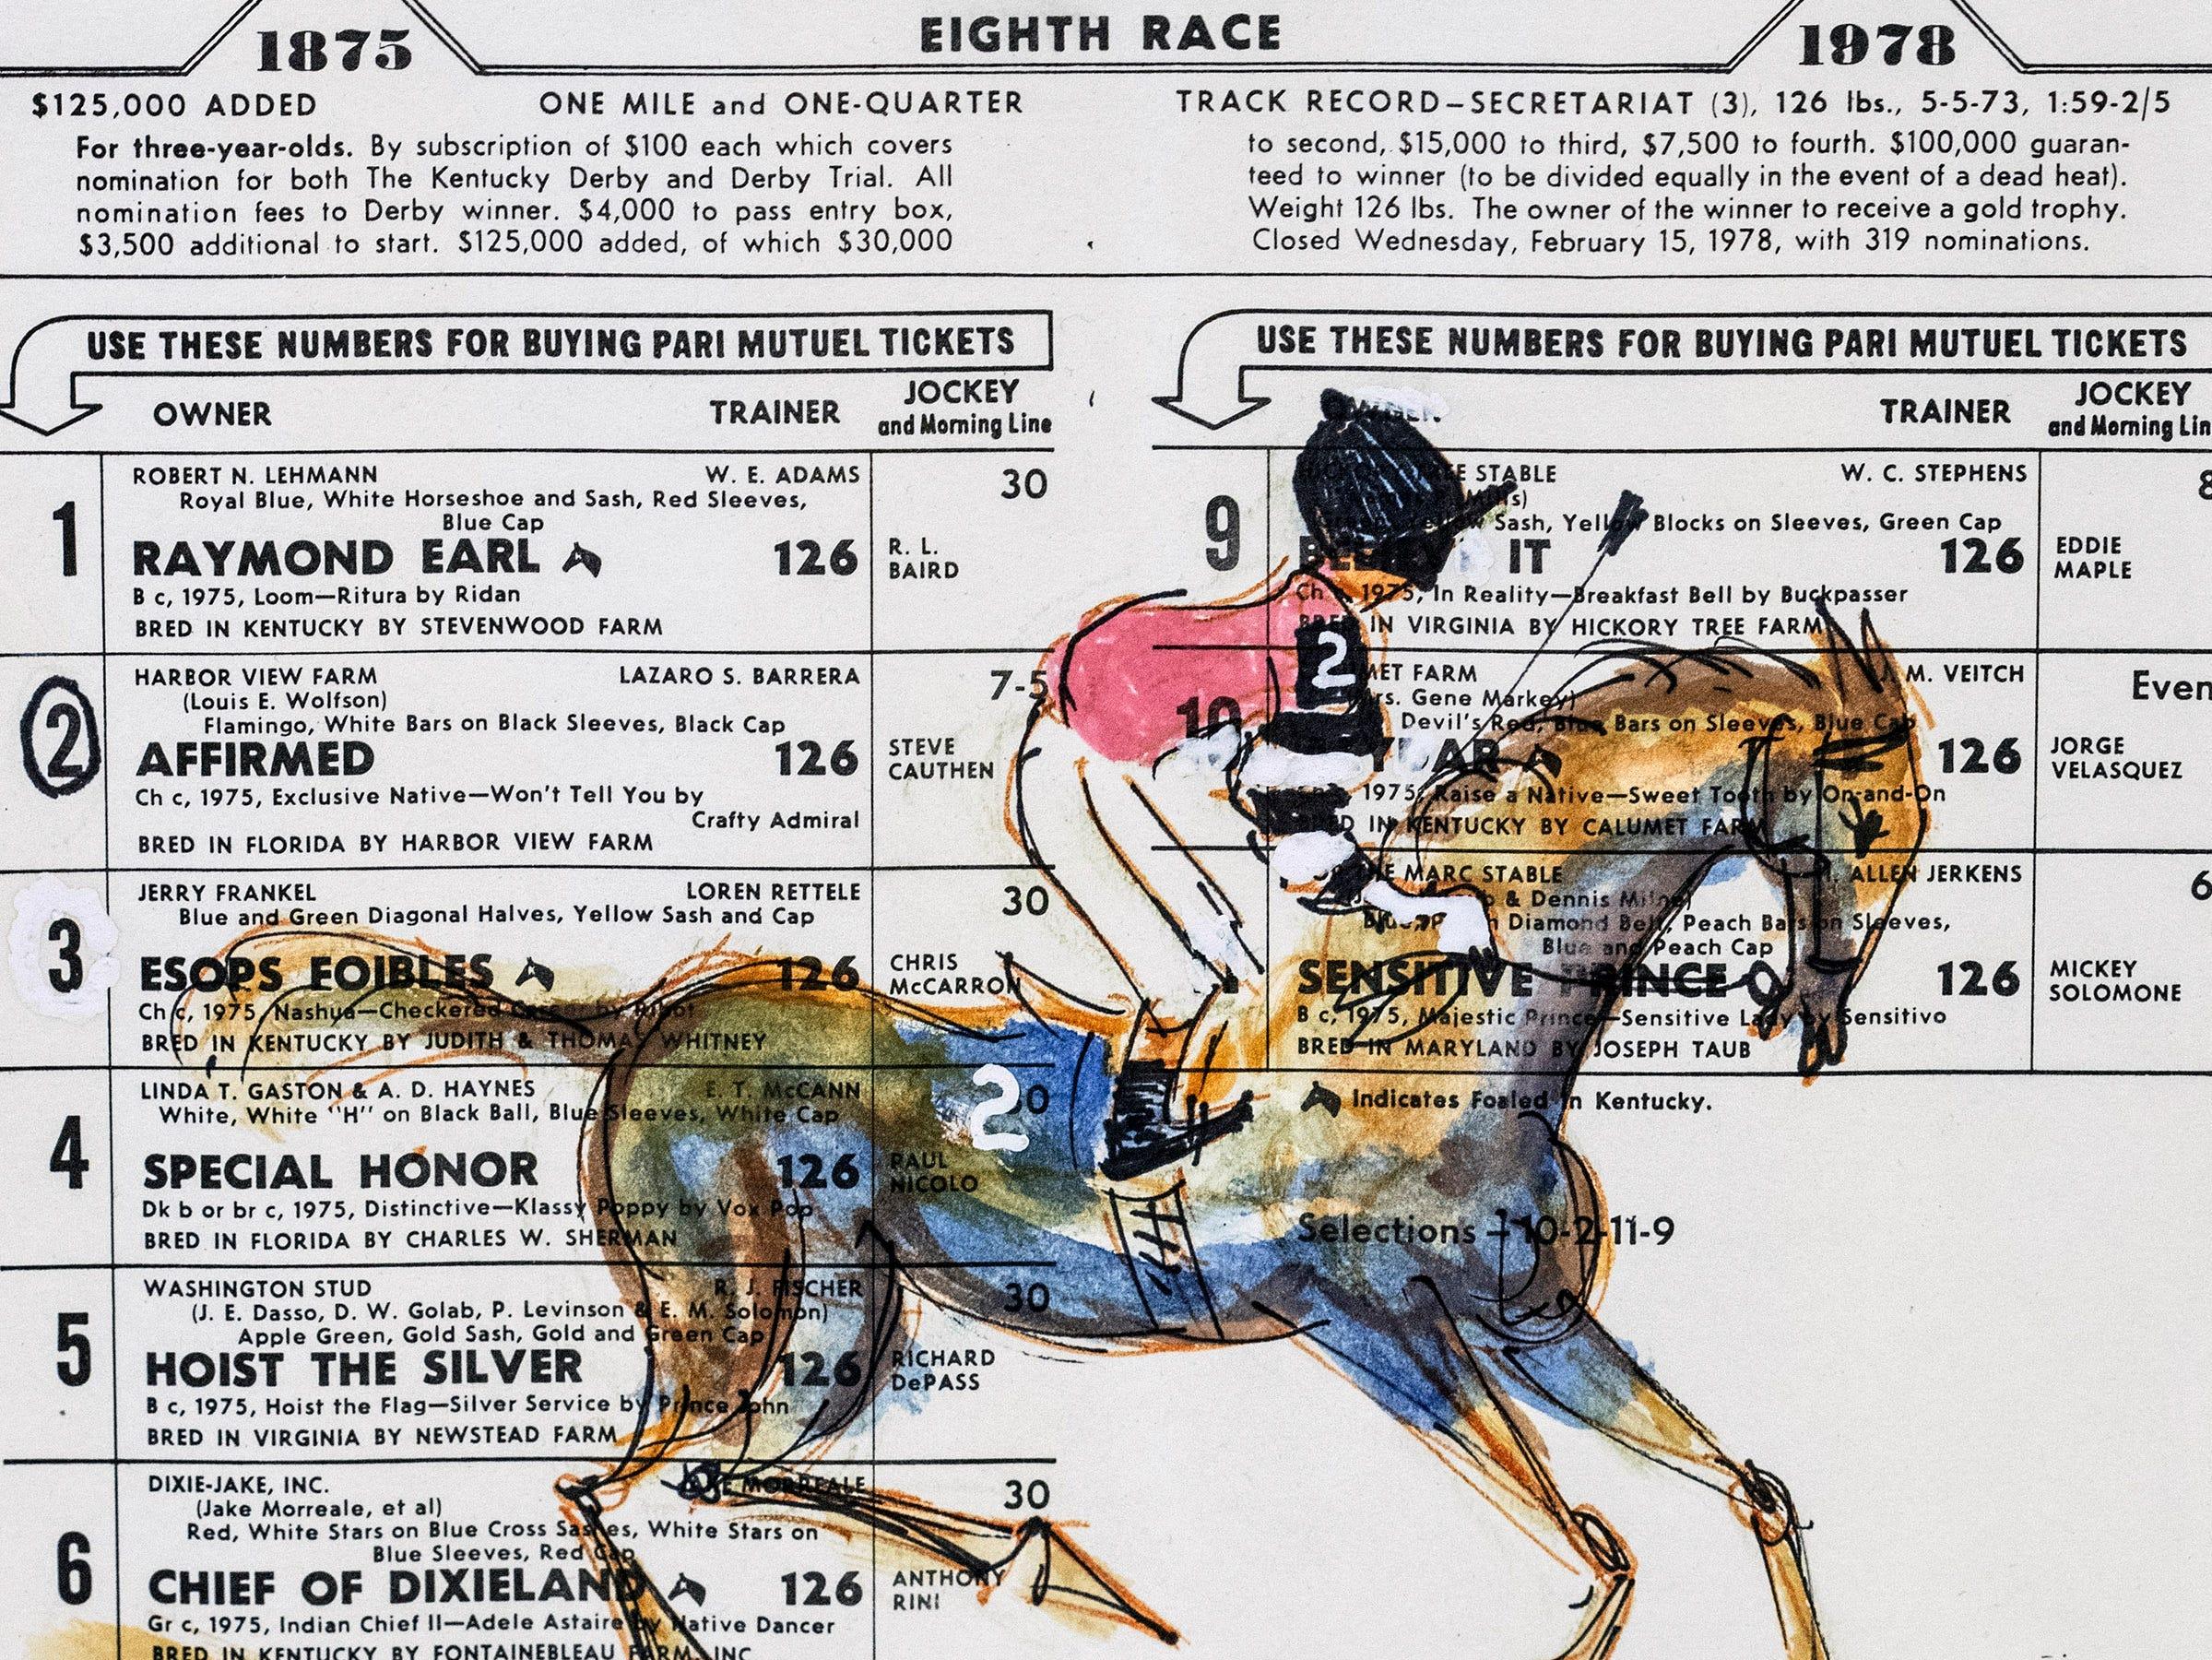 A Mitchell Gordon illustration on a 1978 winning ticket celebrates the Triple Crown run of legendary horse Affirmed. 3/26/19